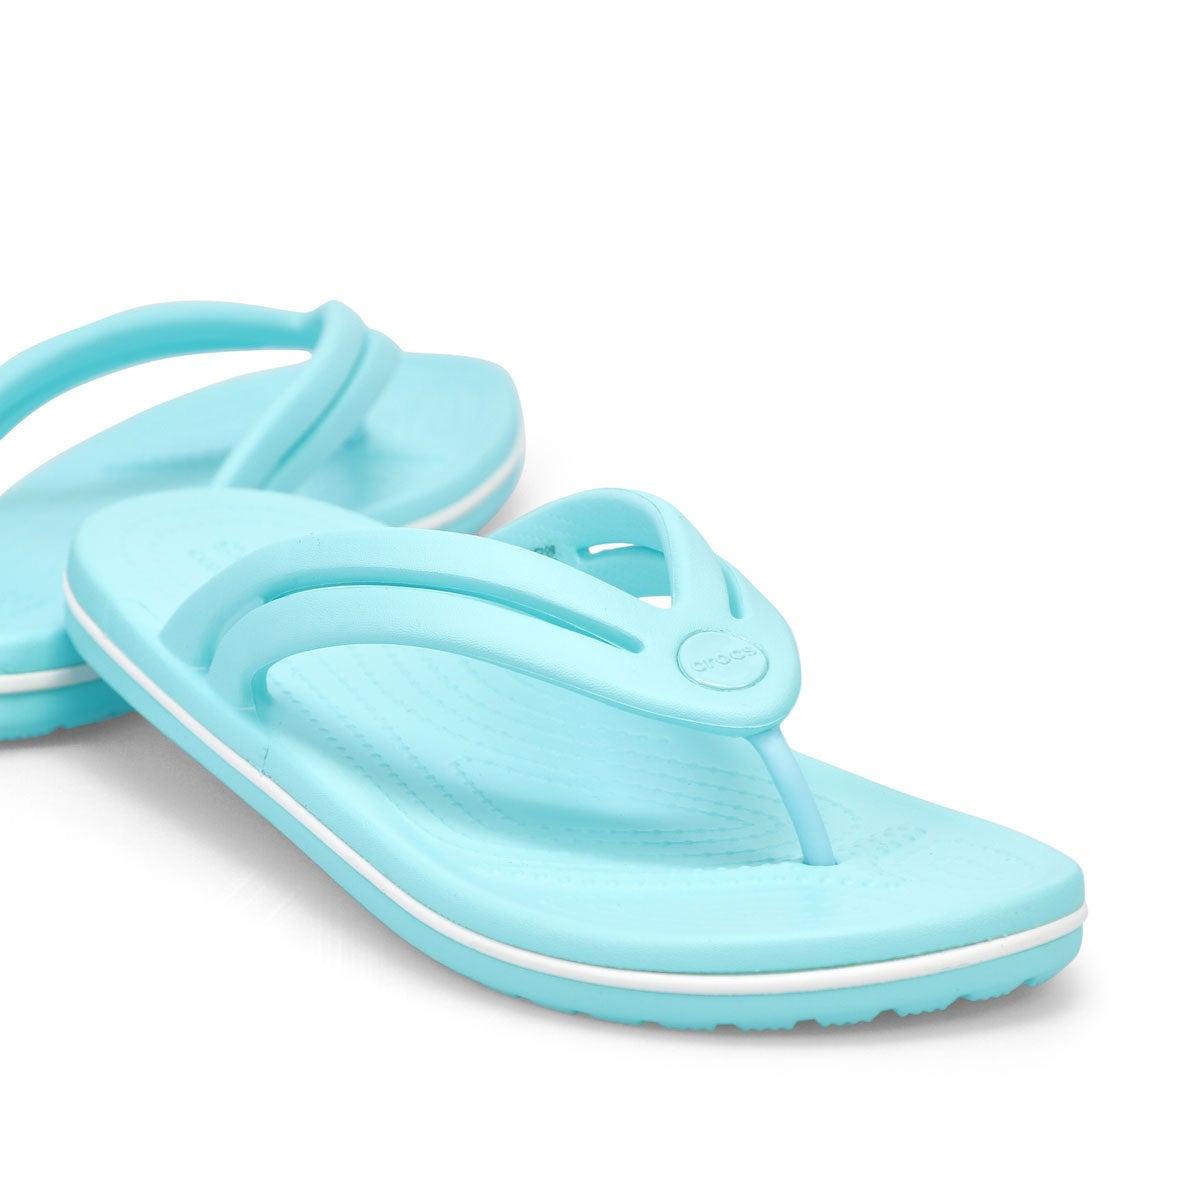 Sandale tong Crocband Flip, femmes - Bleu glacé